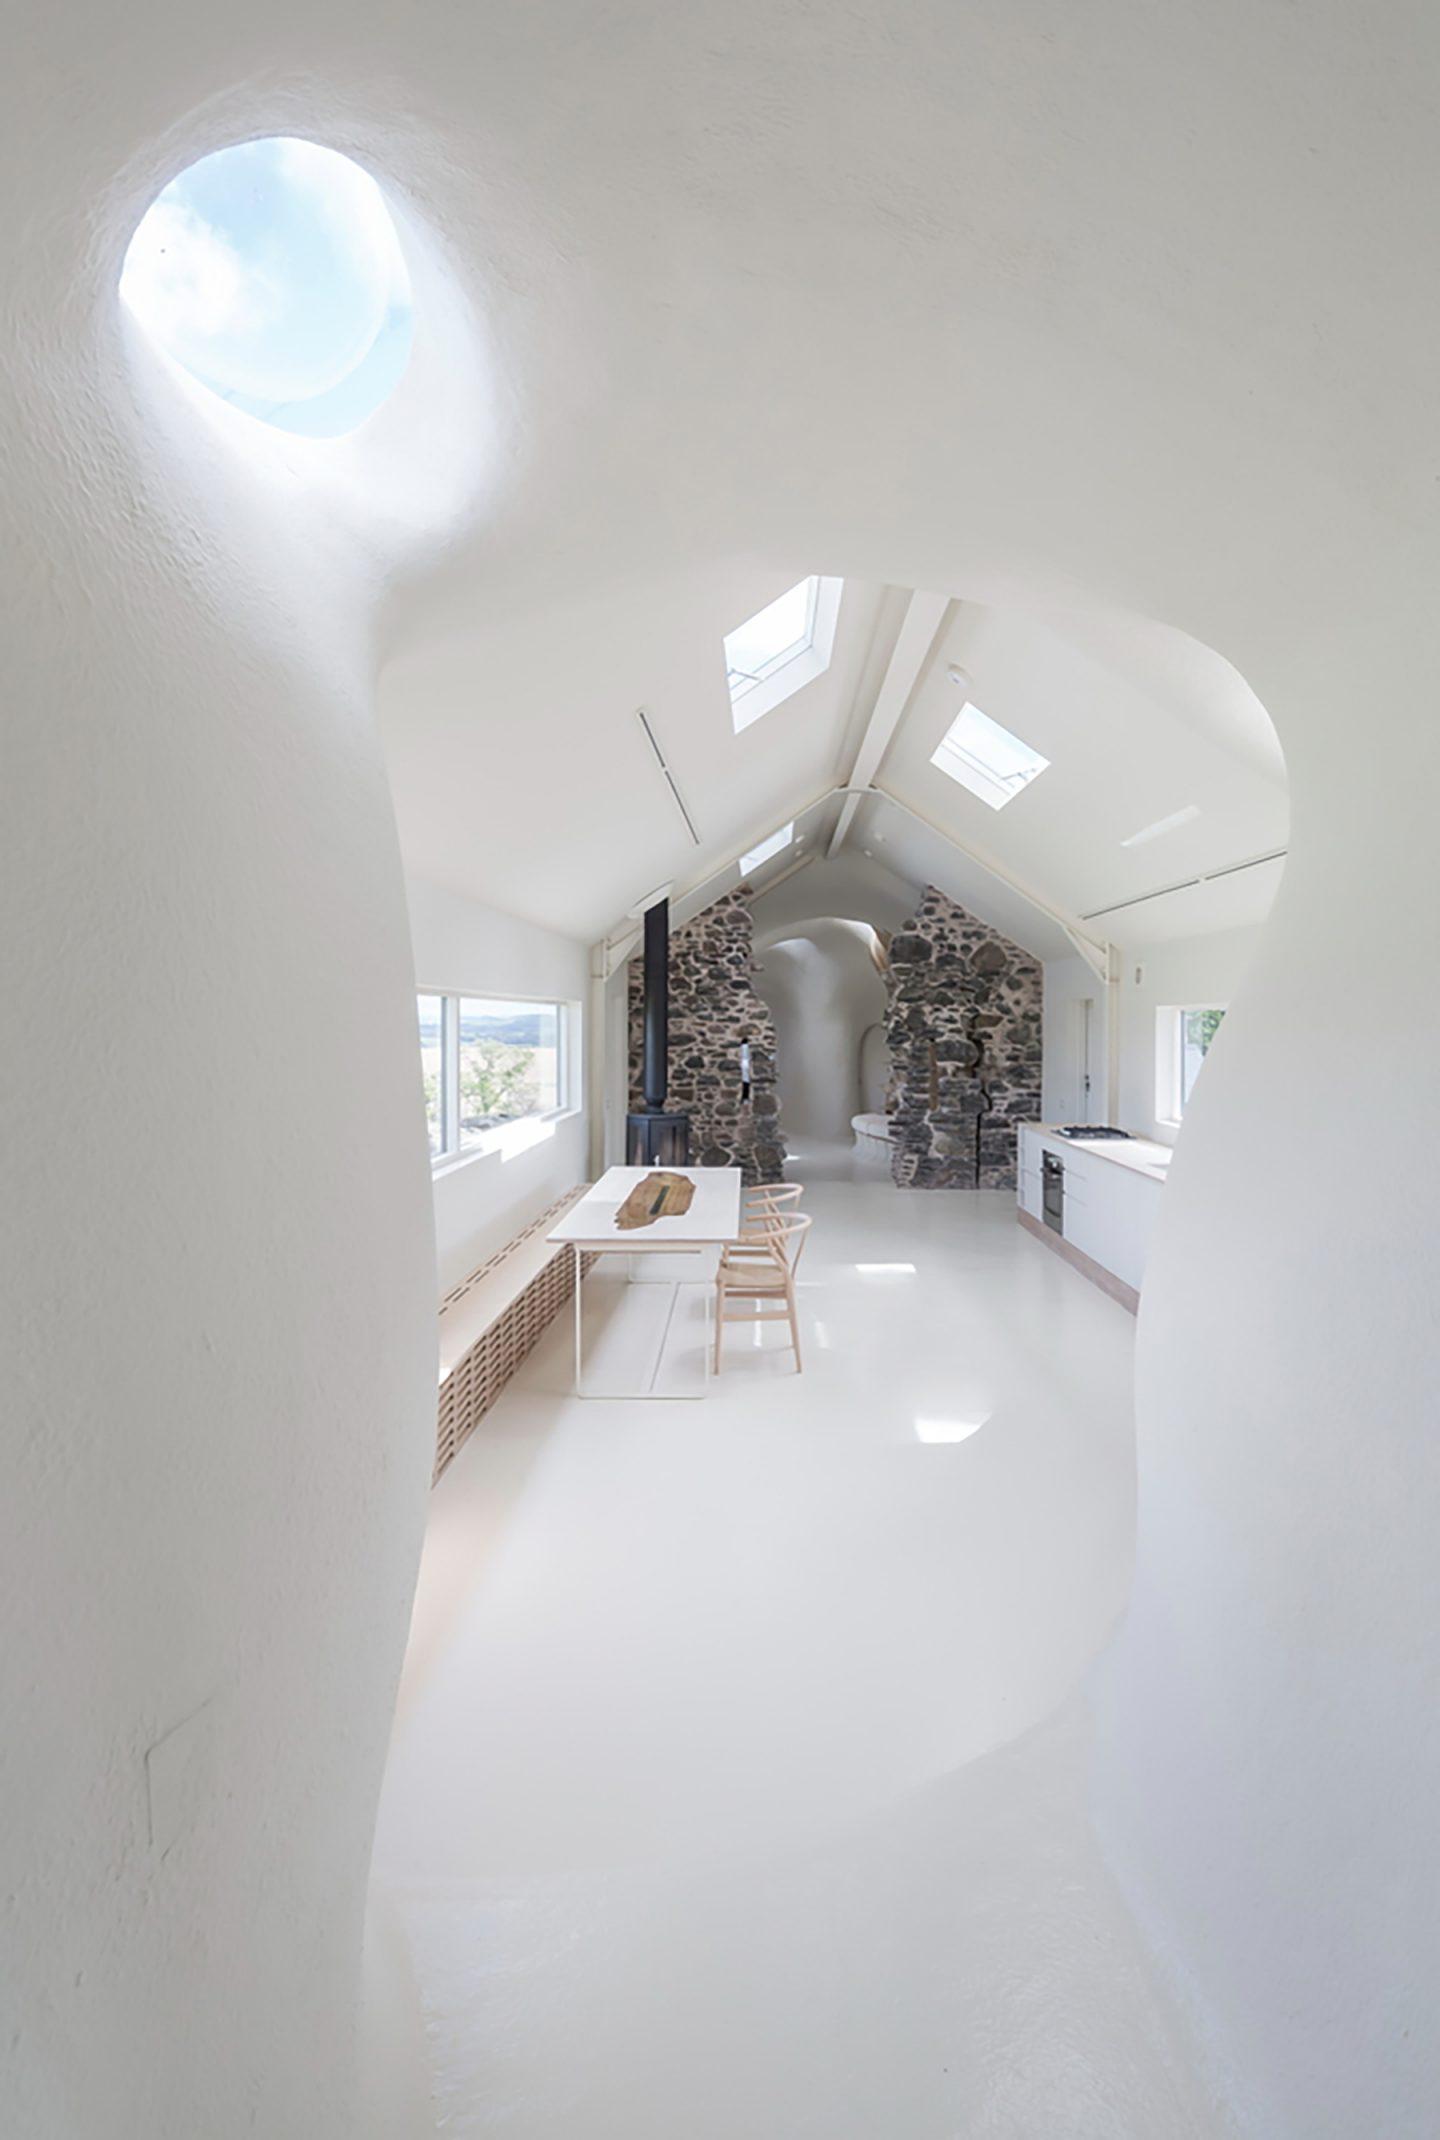 iGNANT-Architecture-Lily-Jencks-Studio-Nathanael-Dorent-Architecture-Ruin-Studio-09